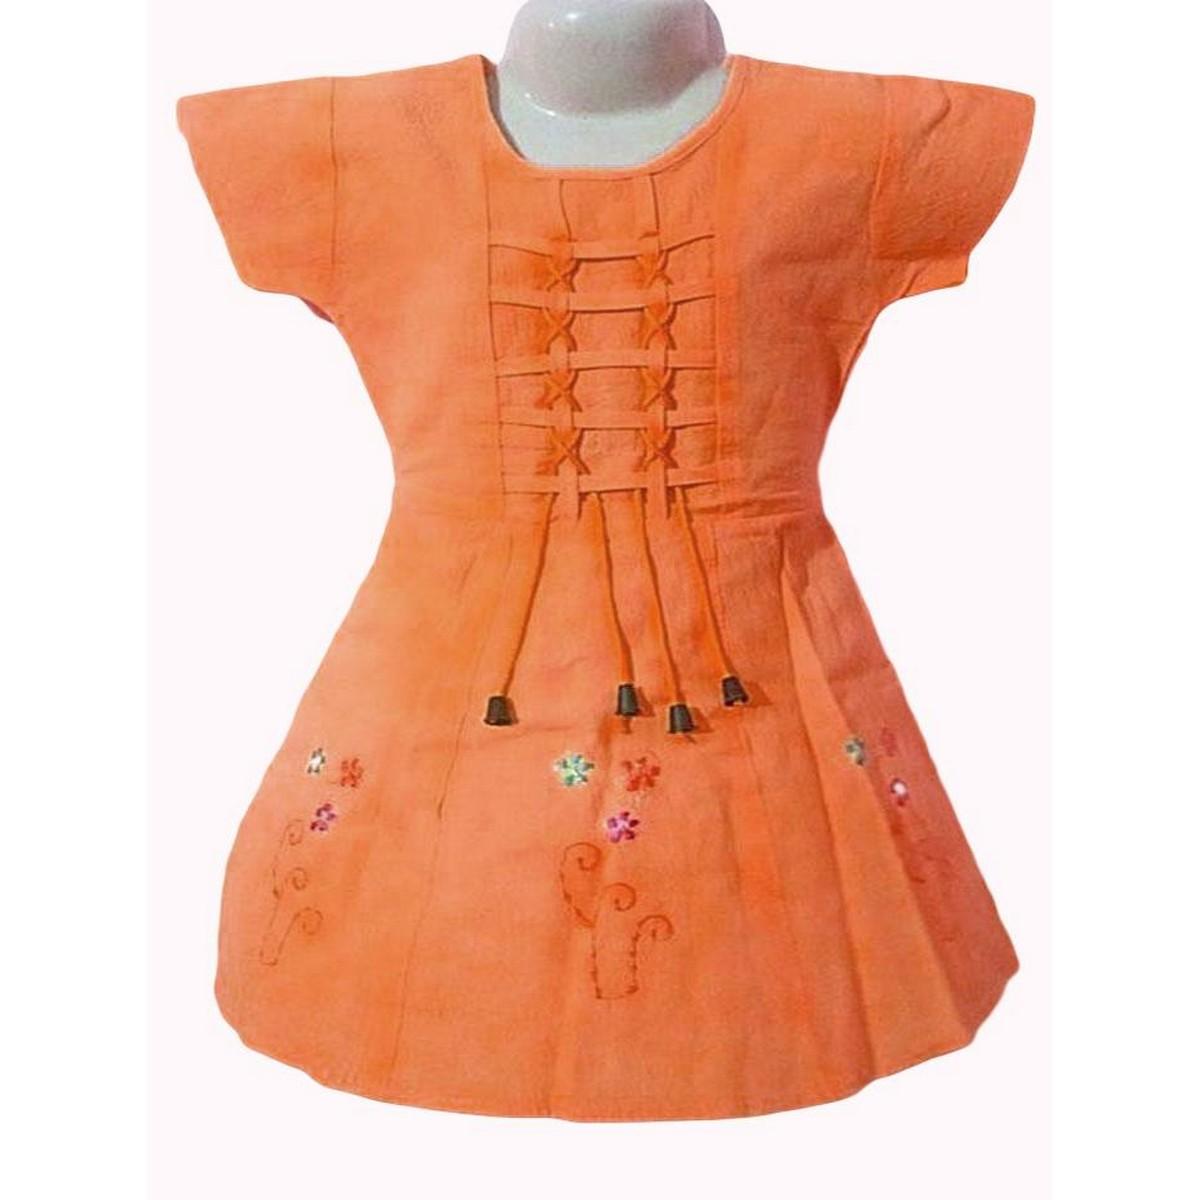 Wardrobe Desire Casual Wear Stone Washed Ruffle Frock for Girls-Orange-4 to 8 Years